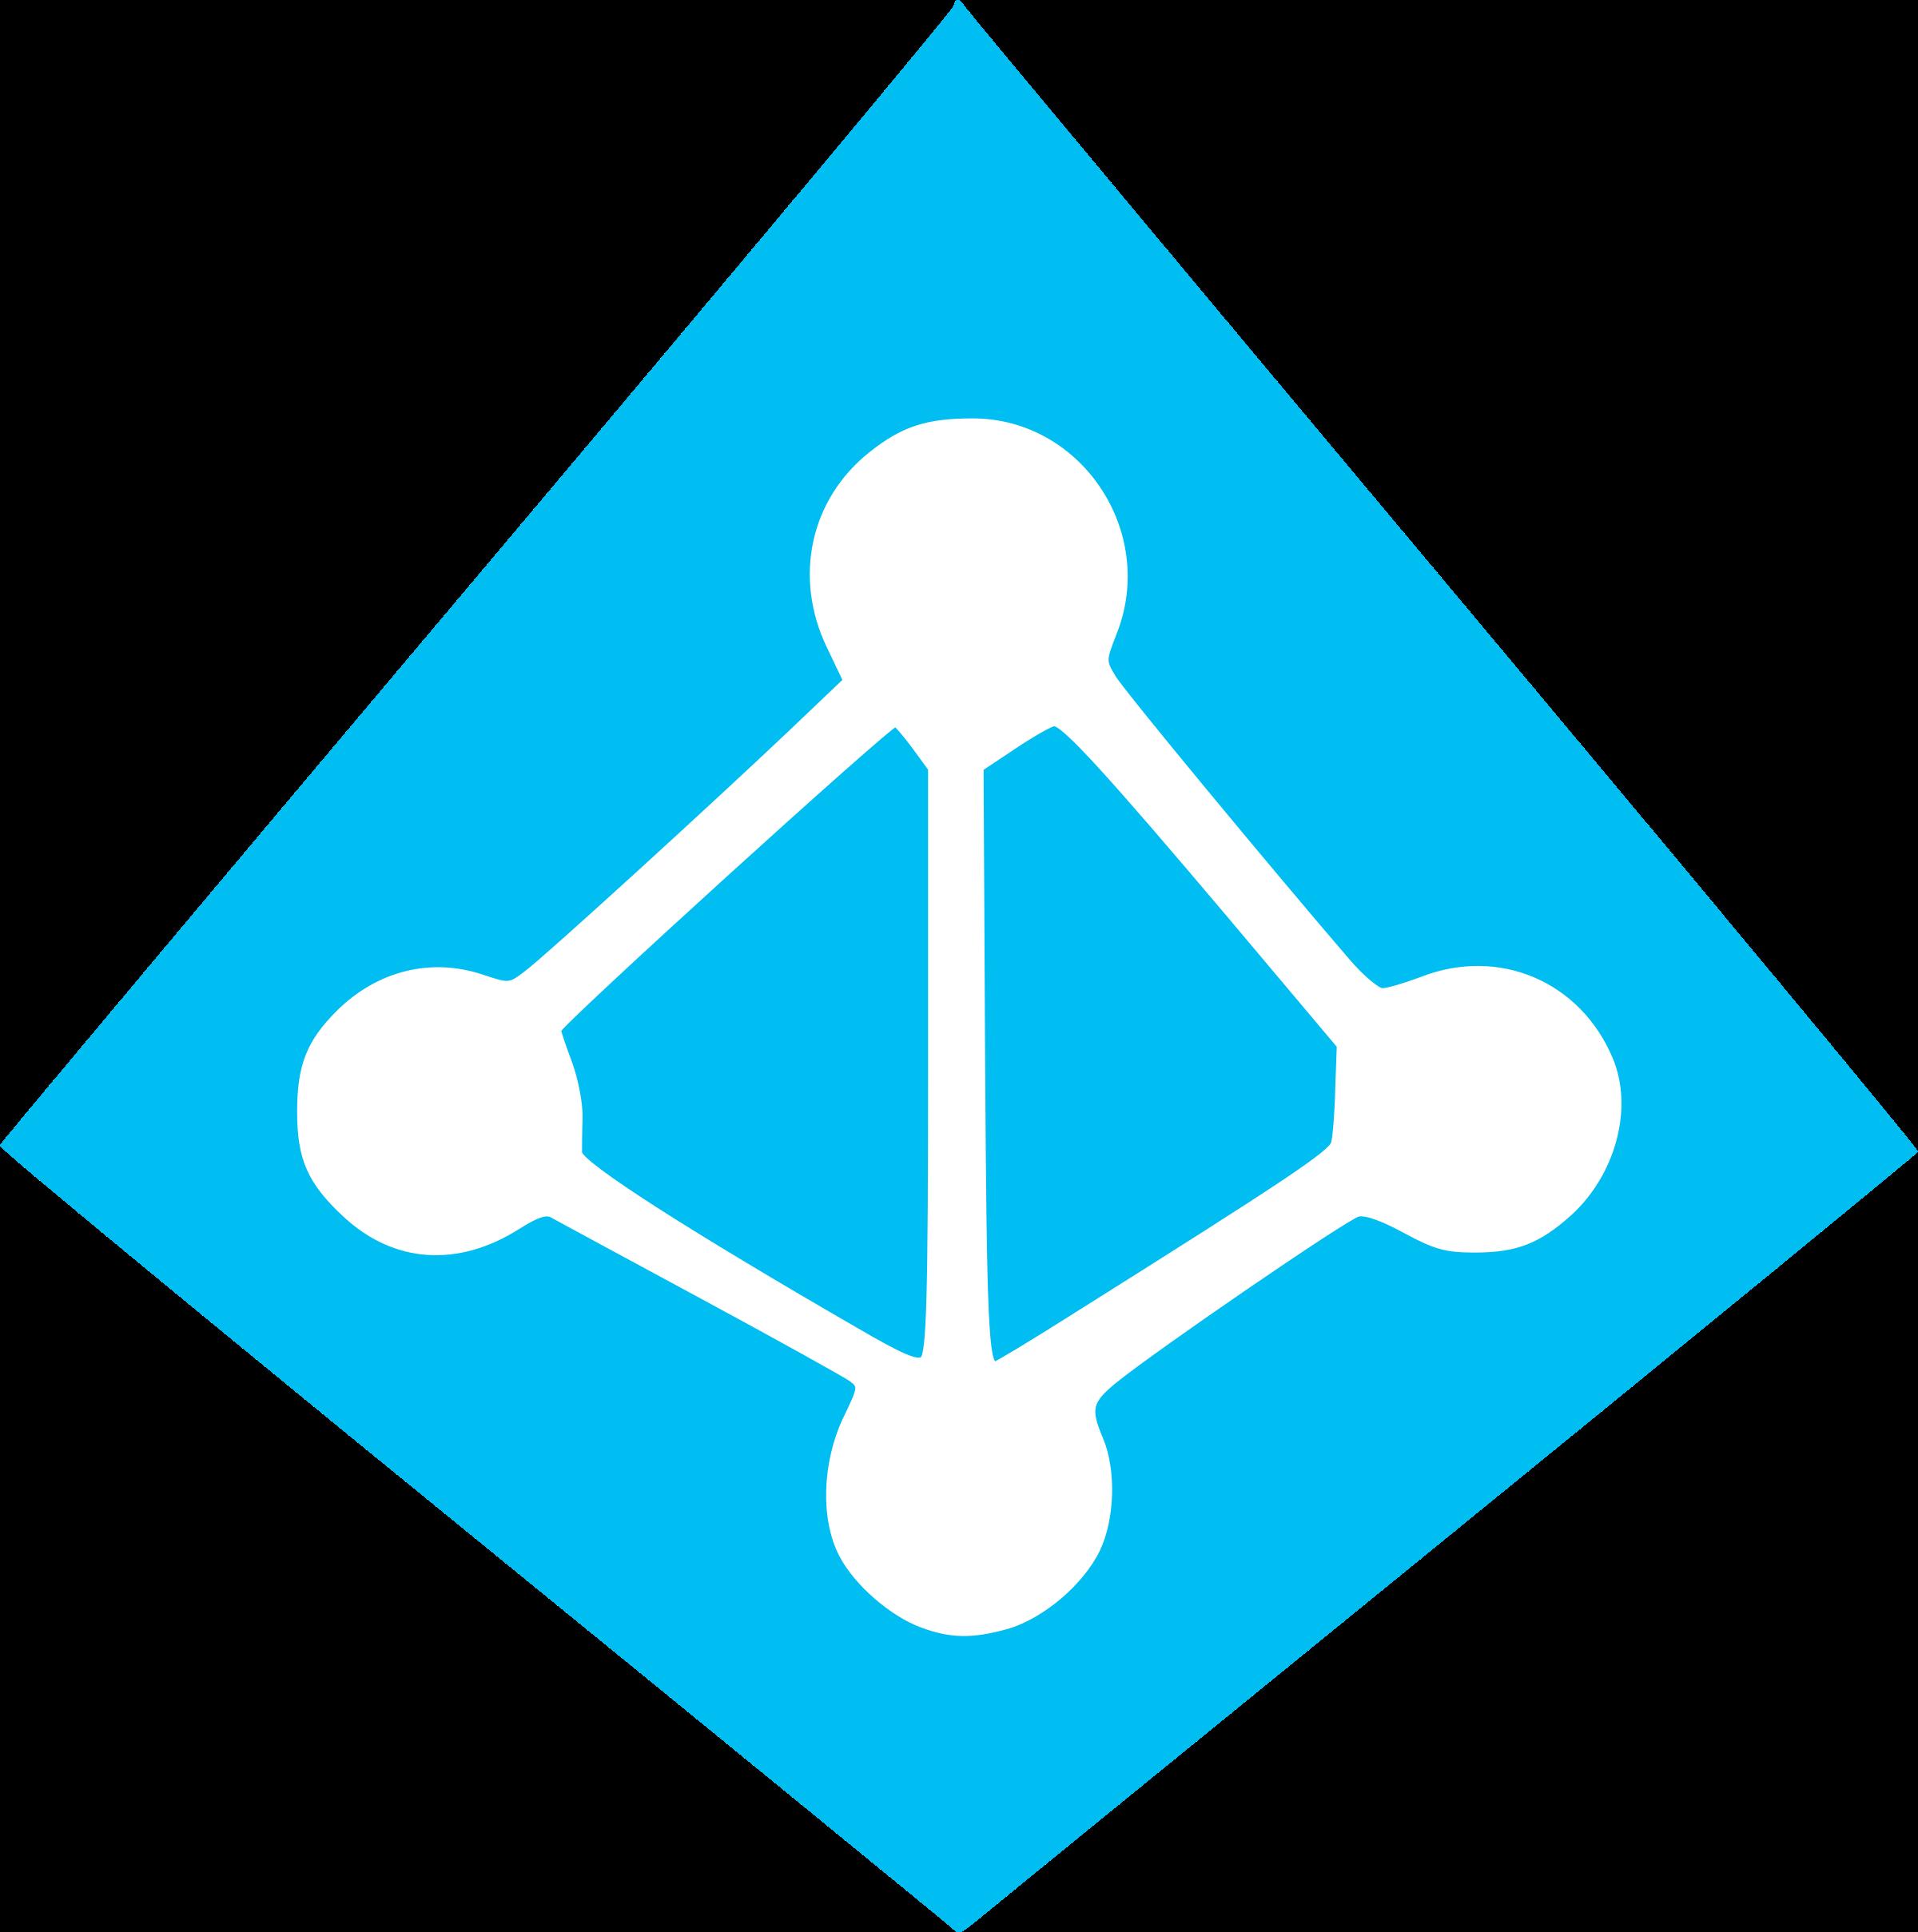 Azure Active Directory Logo PNG Transparent & SVG Vector.